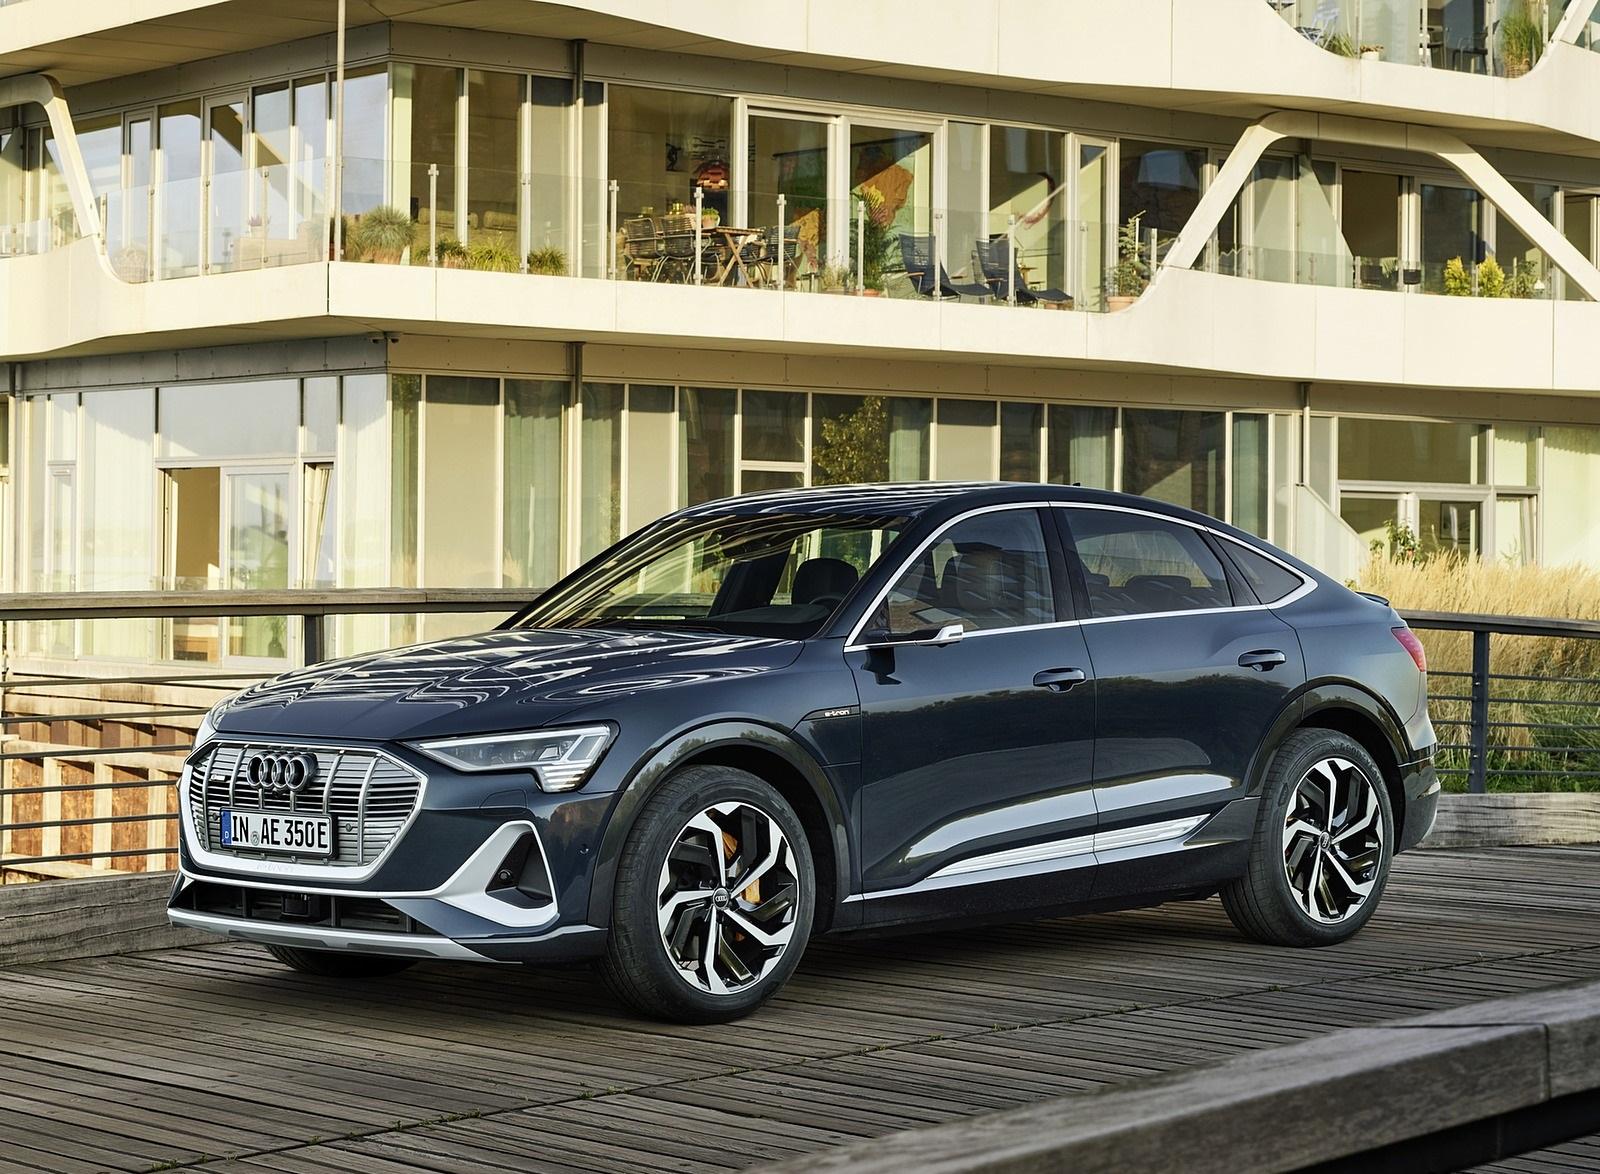 2020 Audi e-tron Sportback (Color: Plasma Blue) Front Three-Quarter Wallpapers (4)